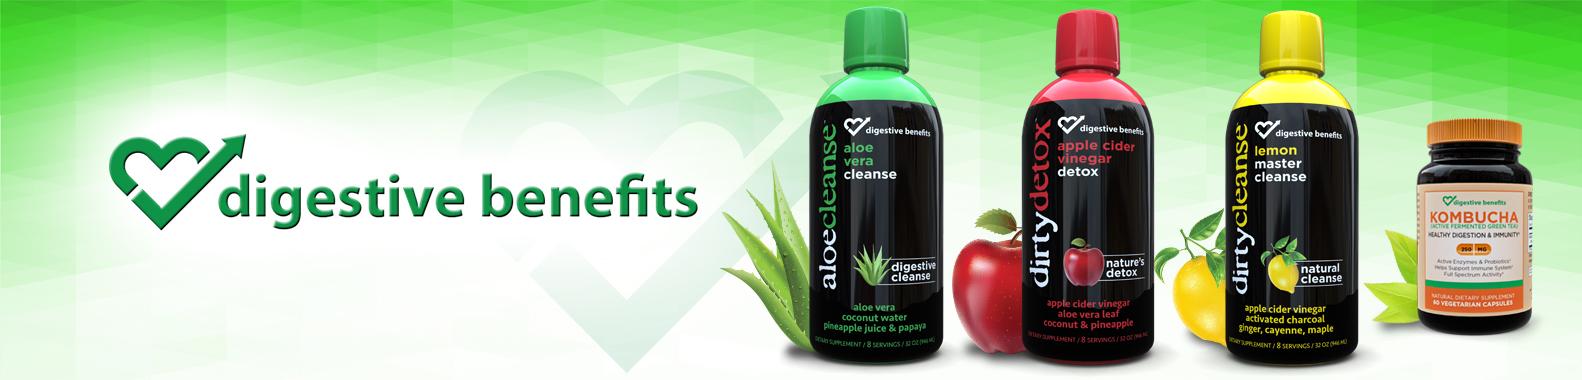 Digestive Benefits